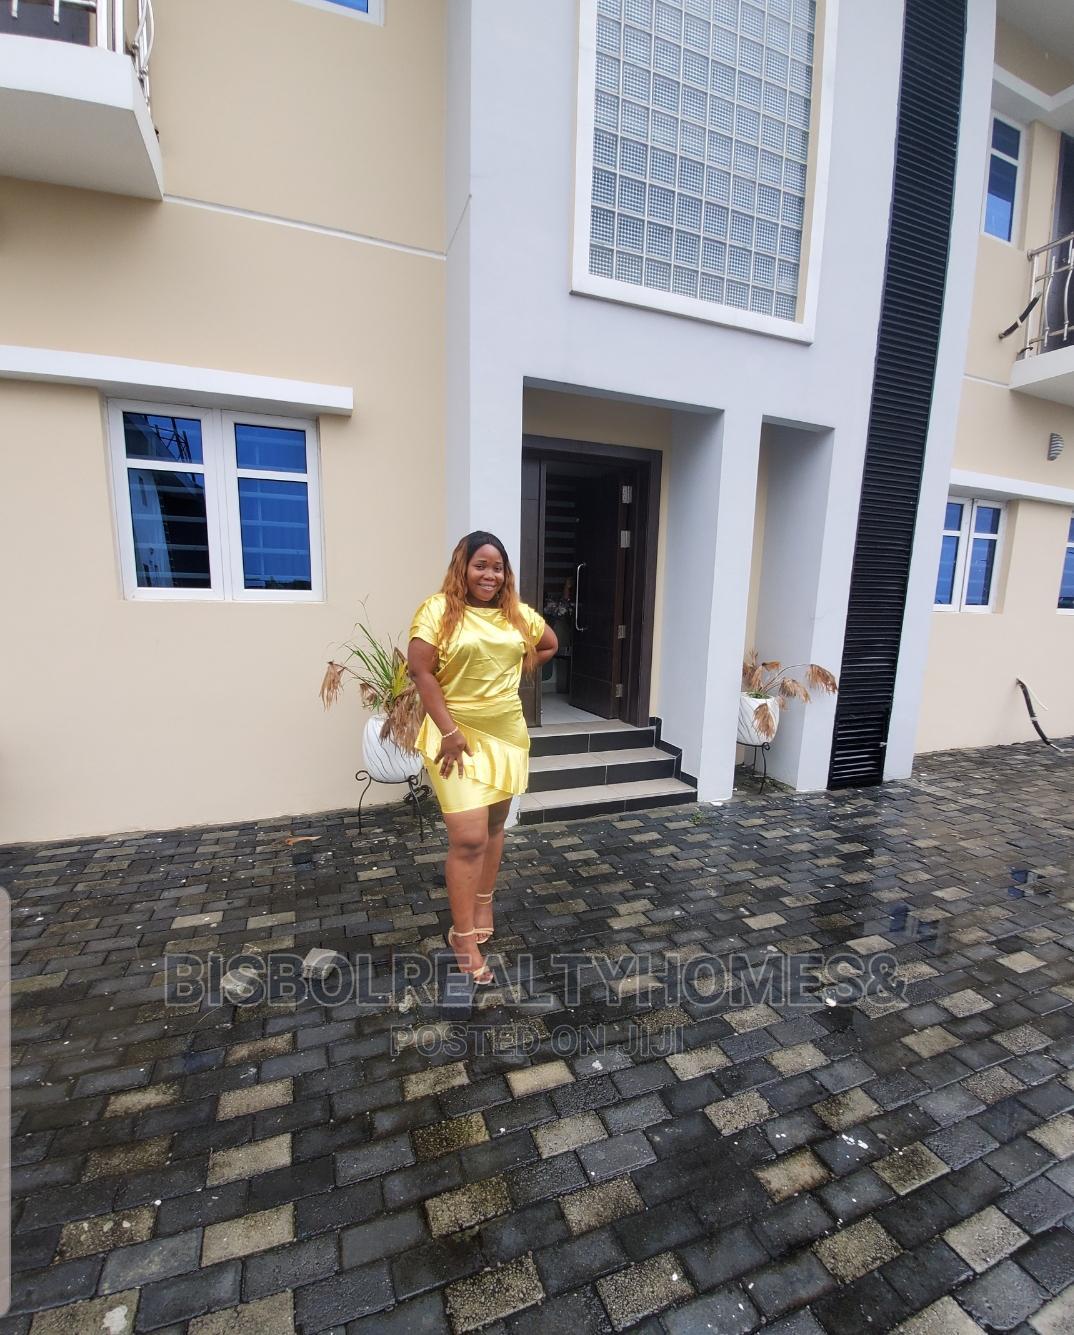 4bdrm Duplex in Flourish Estate, Sangotedo for Sale